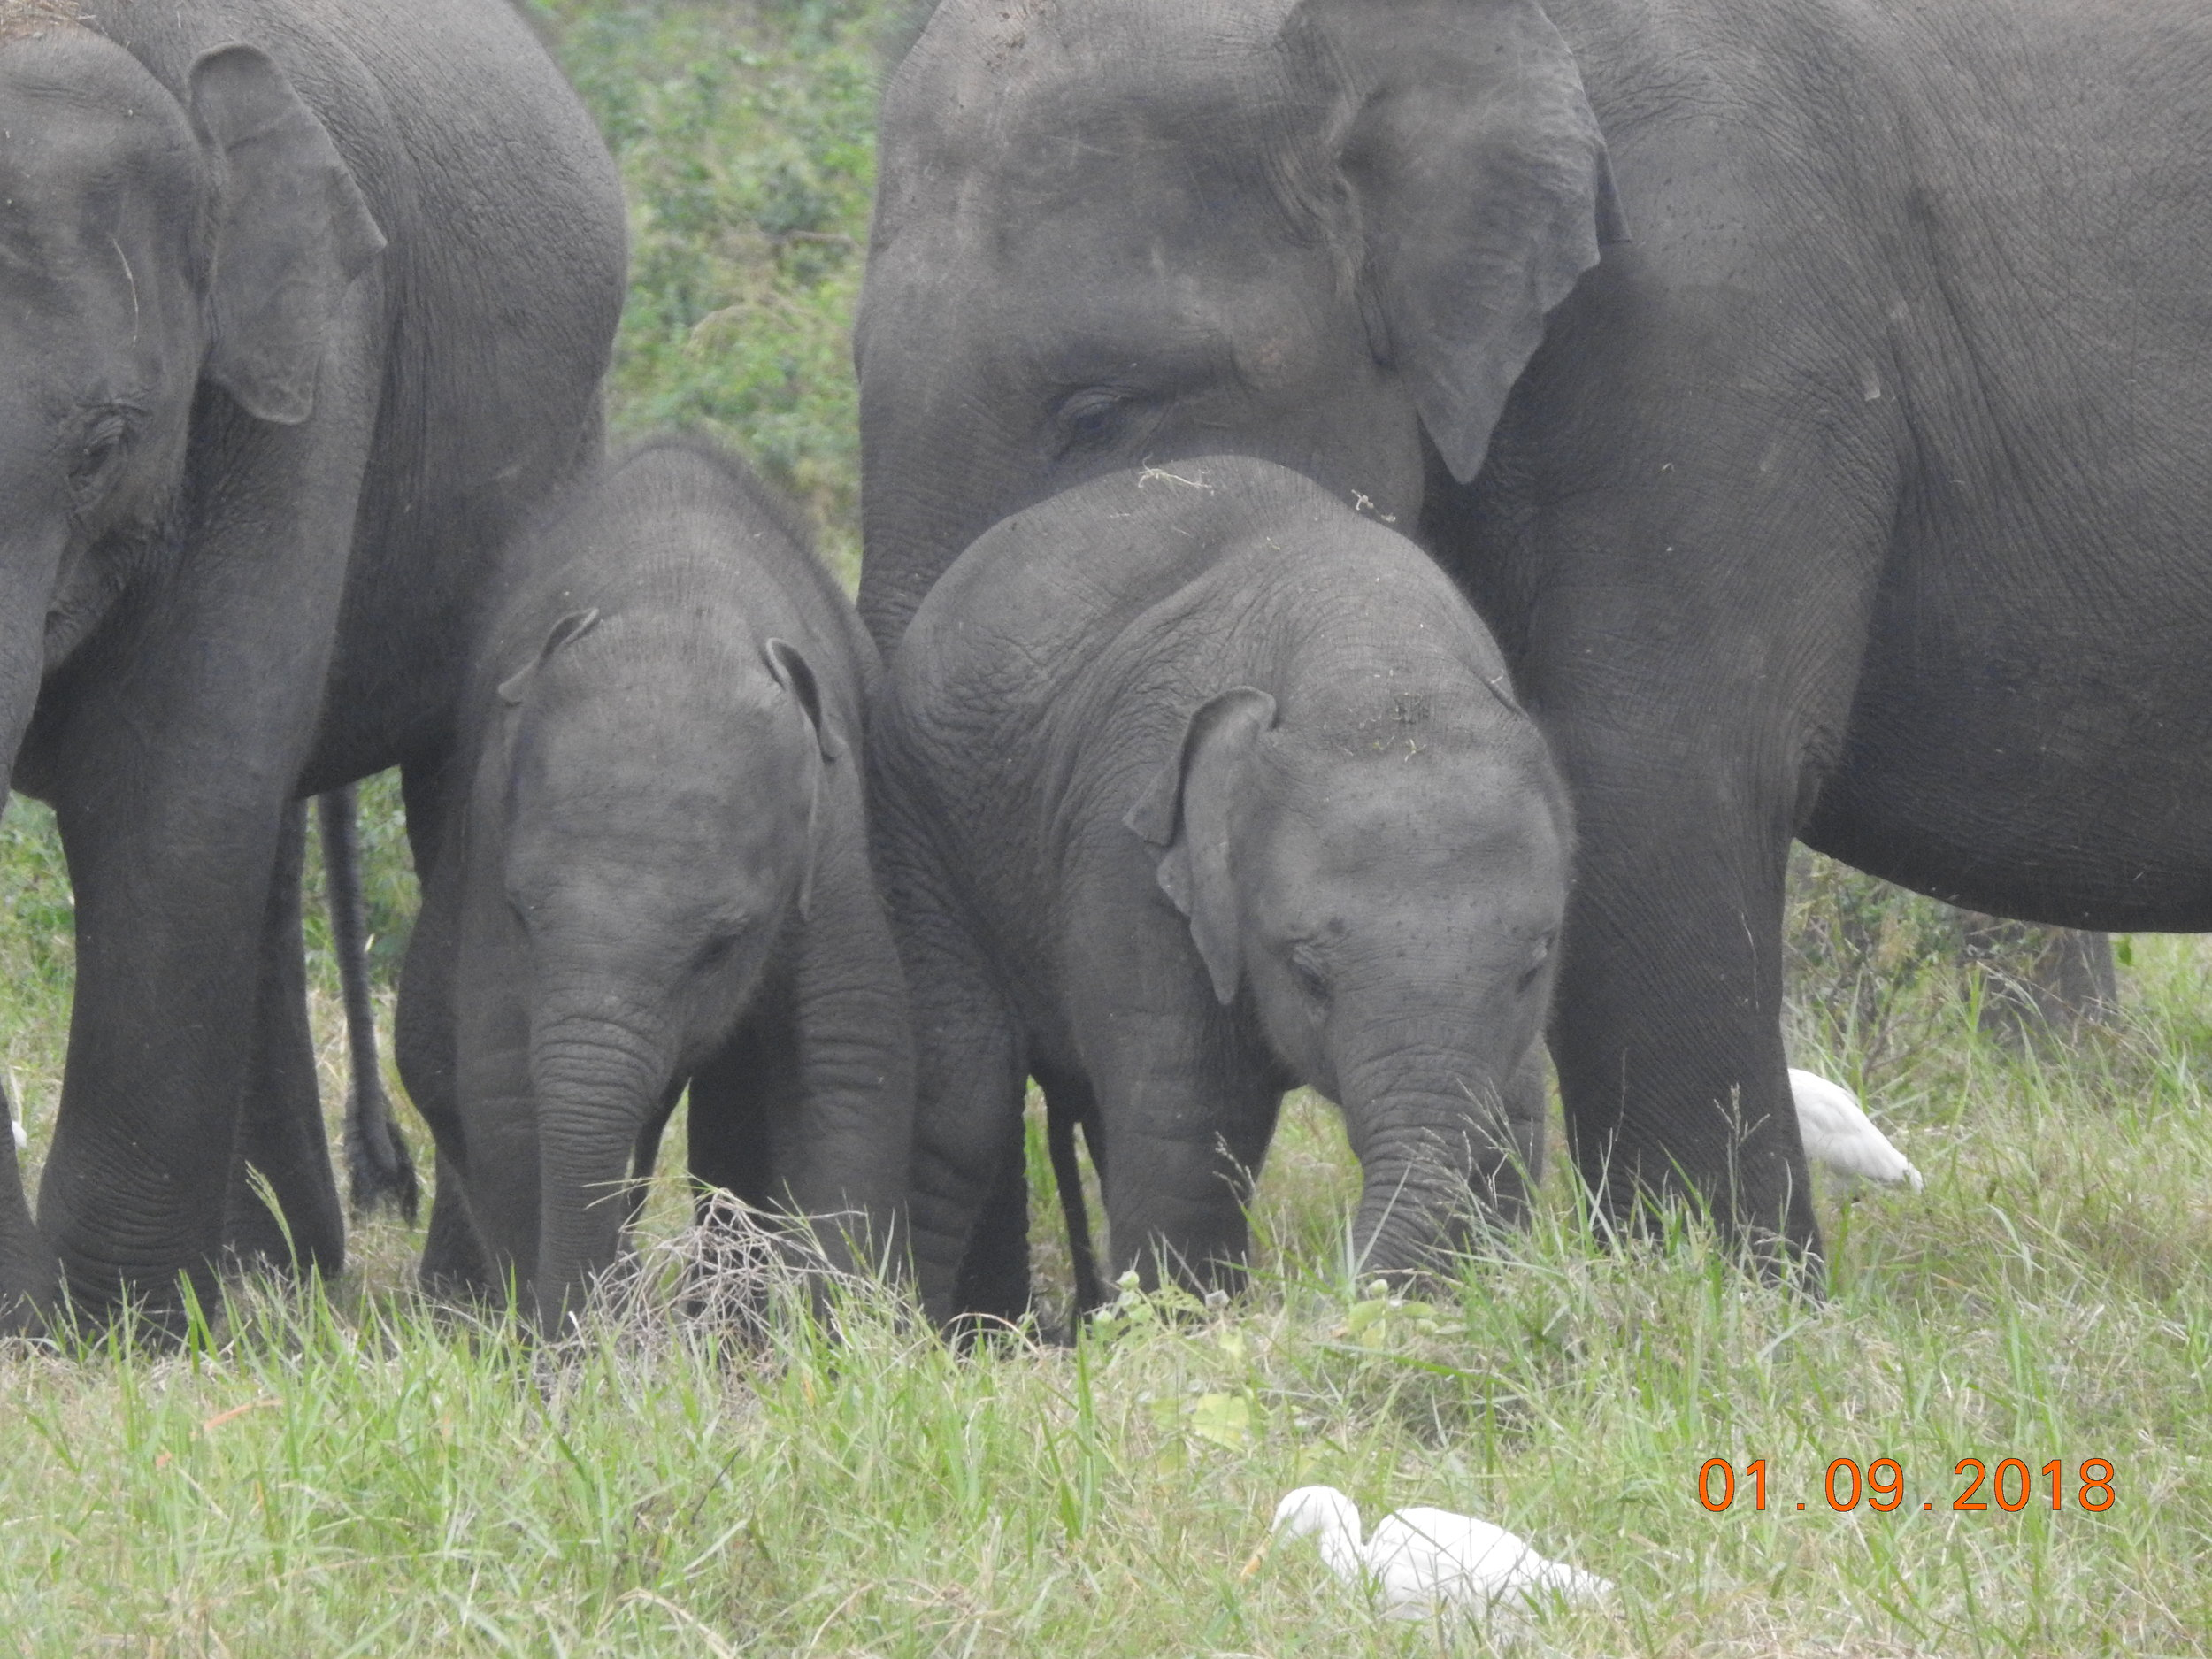 invite-to-paradise-sri-lanka-maldives-holiday-specialists-nutan-vidyut-patel-elephants-1.JPG